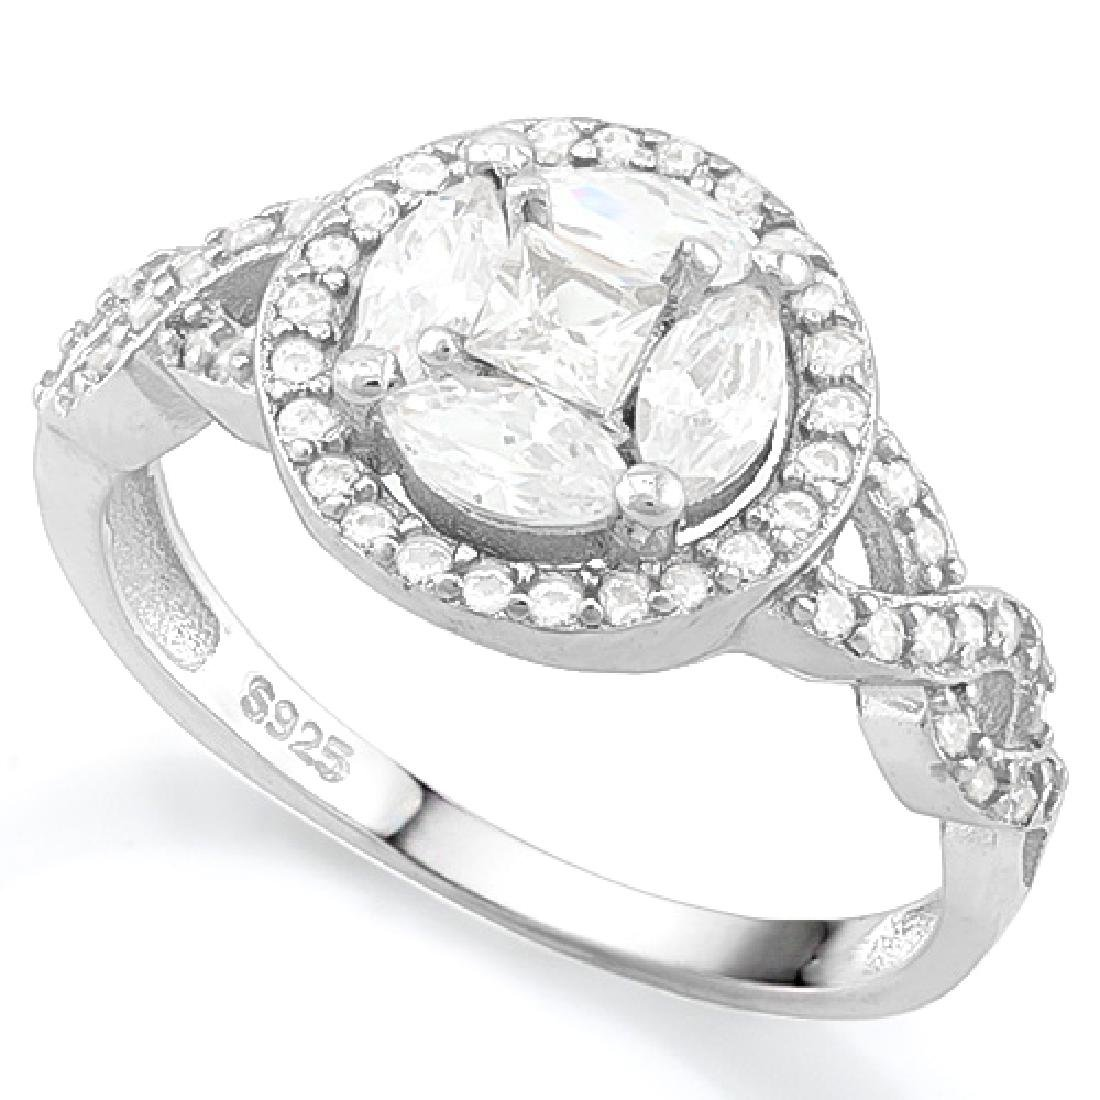 5 3/4 CARAT (57 PCS) FLAWLESS CREATED DIAMOND 925 STERL